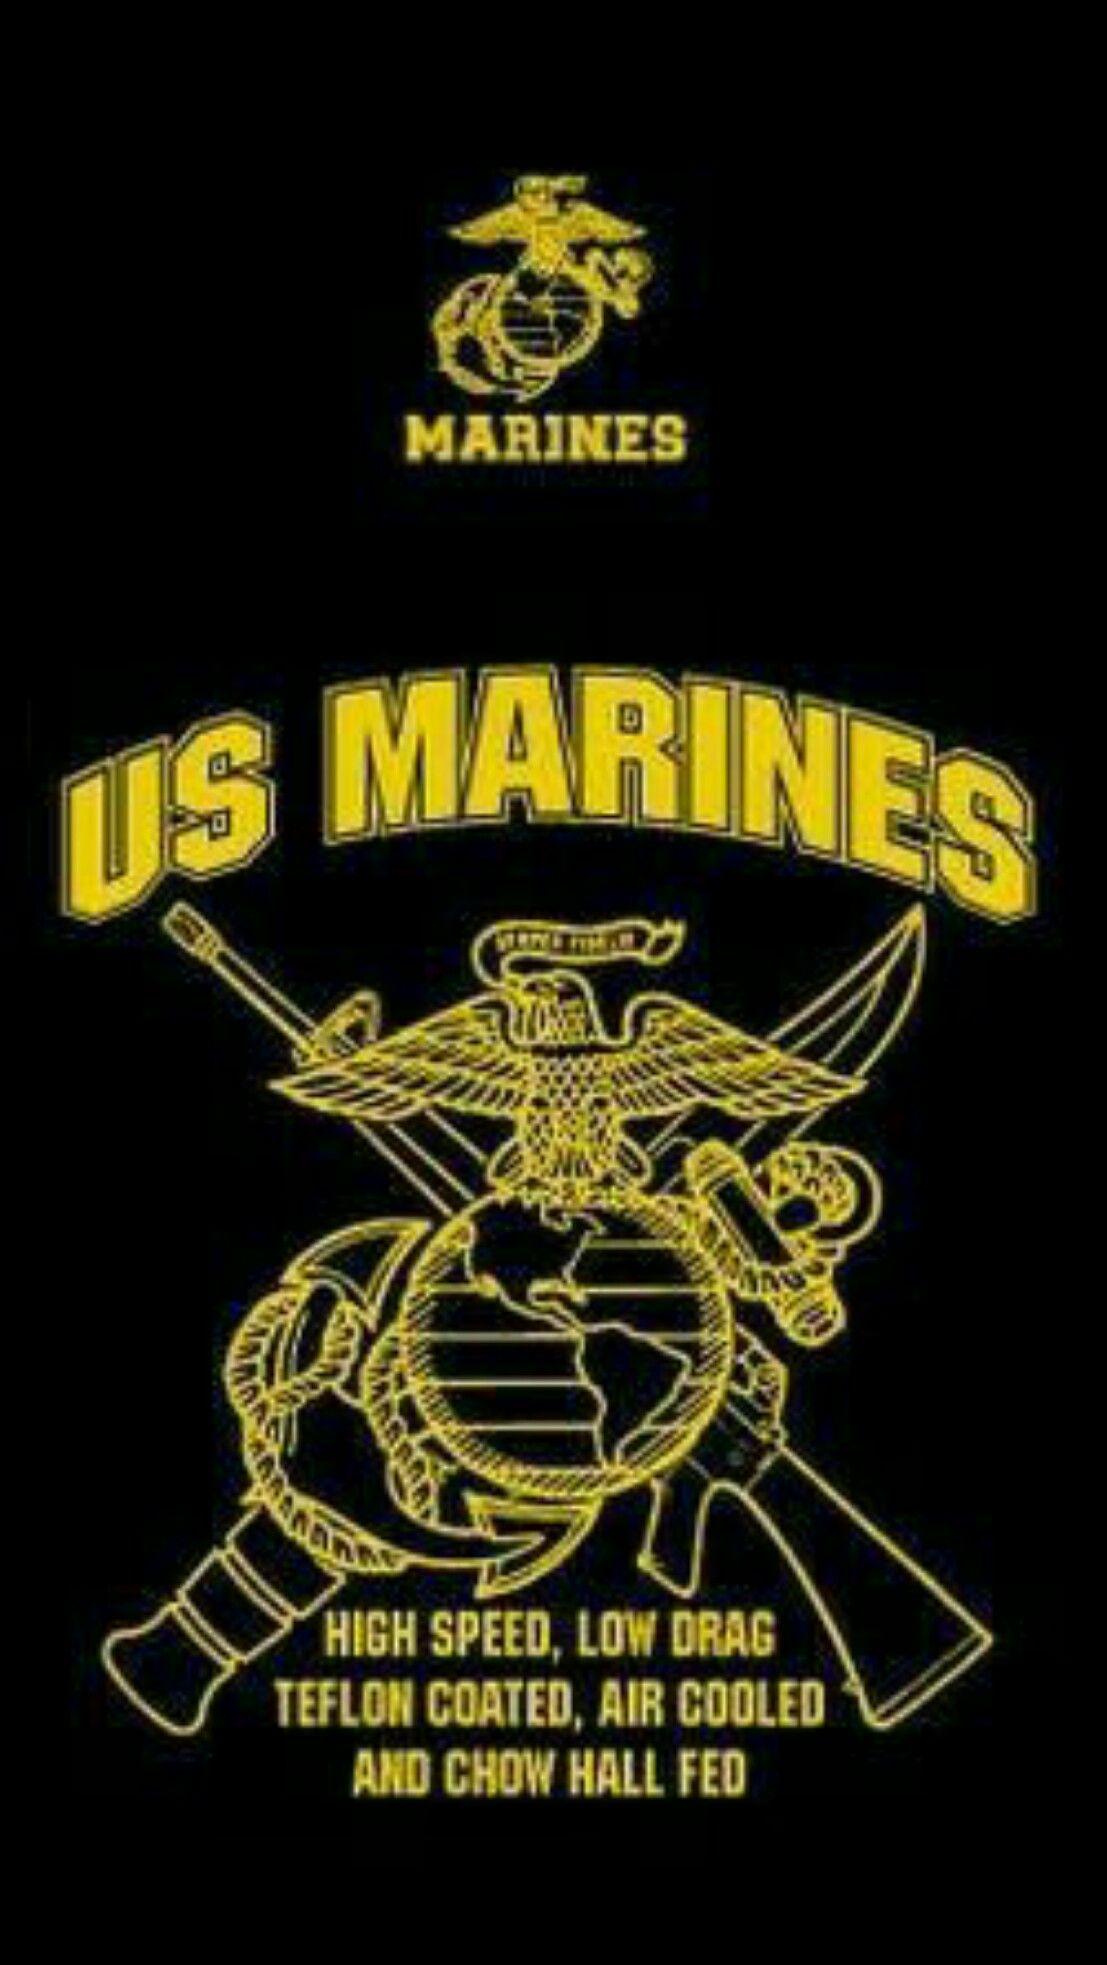 marines usa black wallpaper android iphone Marine